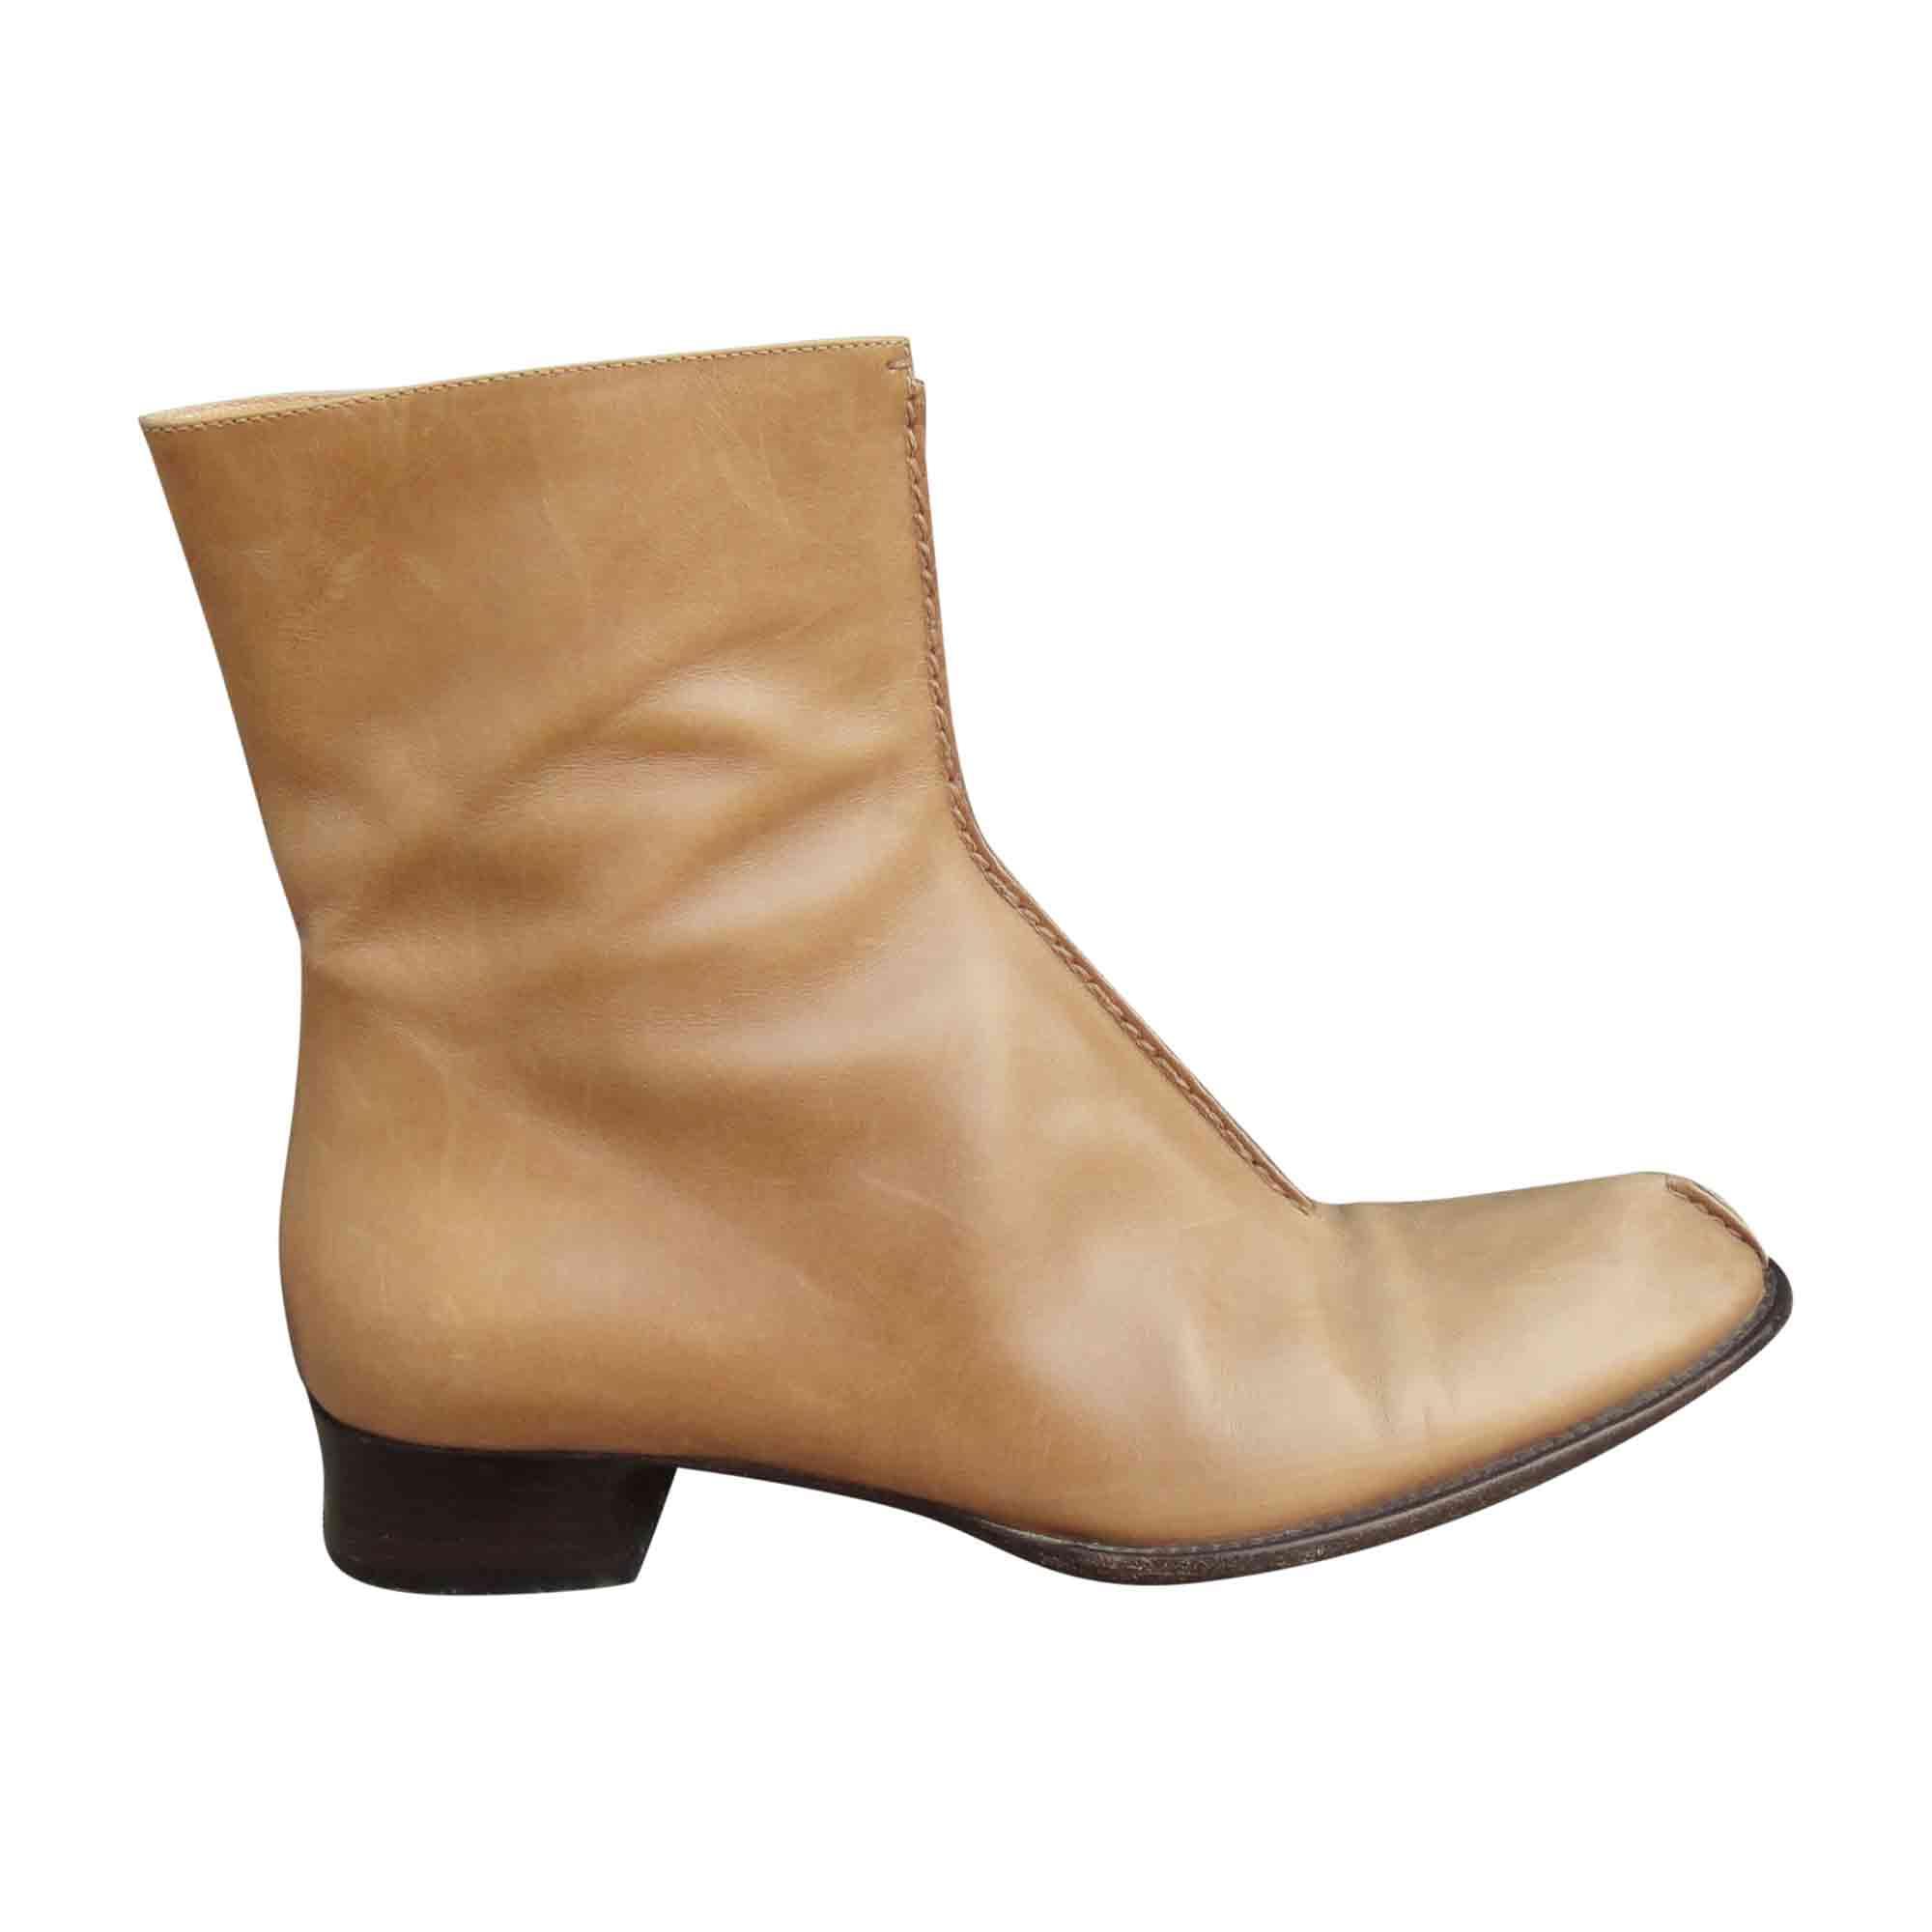 on sale sale uk cozy fresh High Heel Ankle Boots BALLY